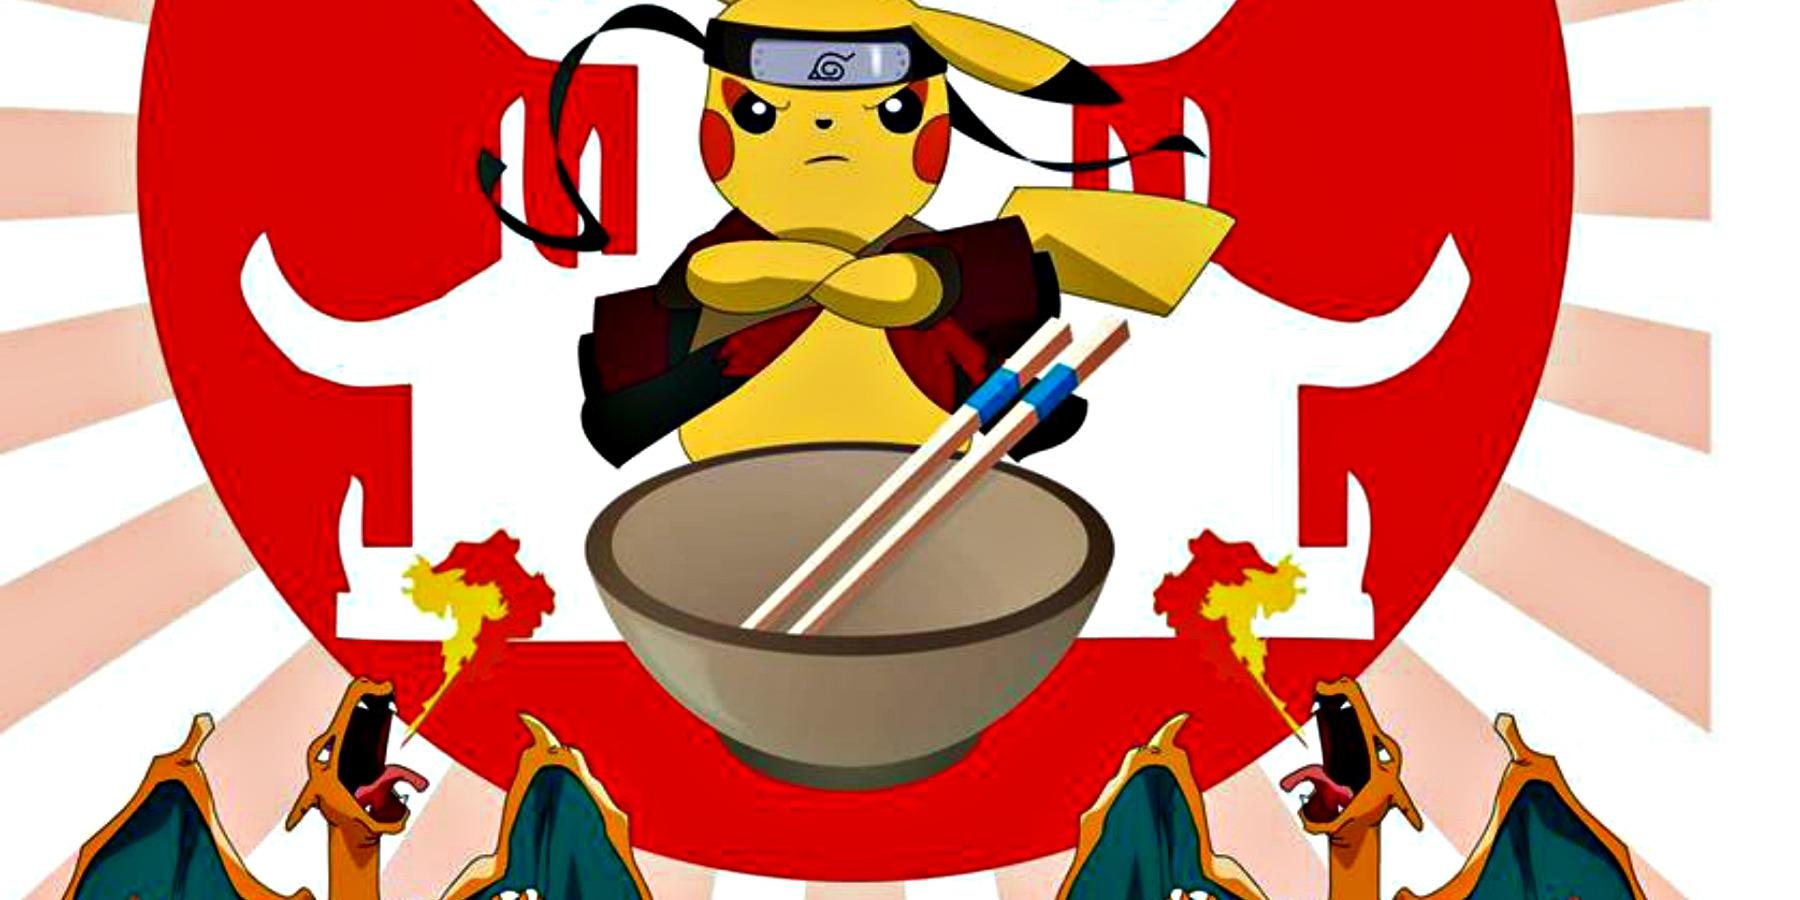 TOKIO FEST FERIA Navideña: Anime y Comida Japonesa